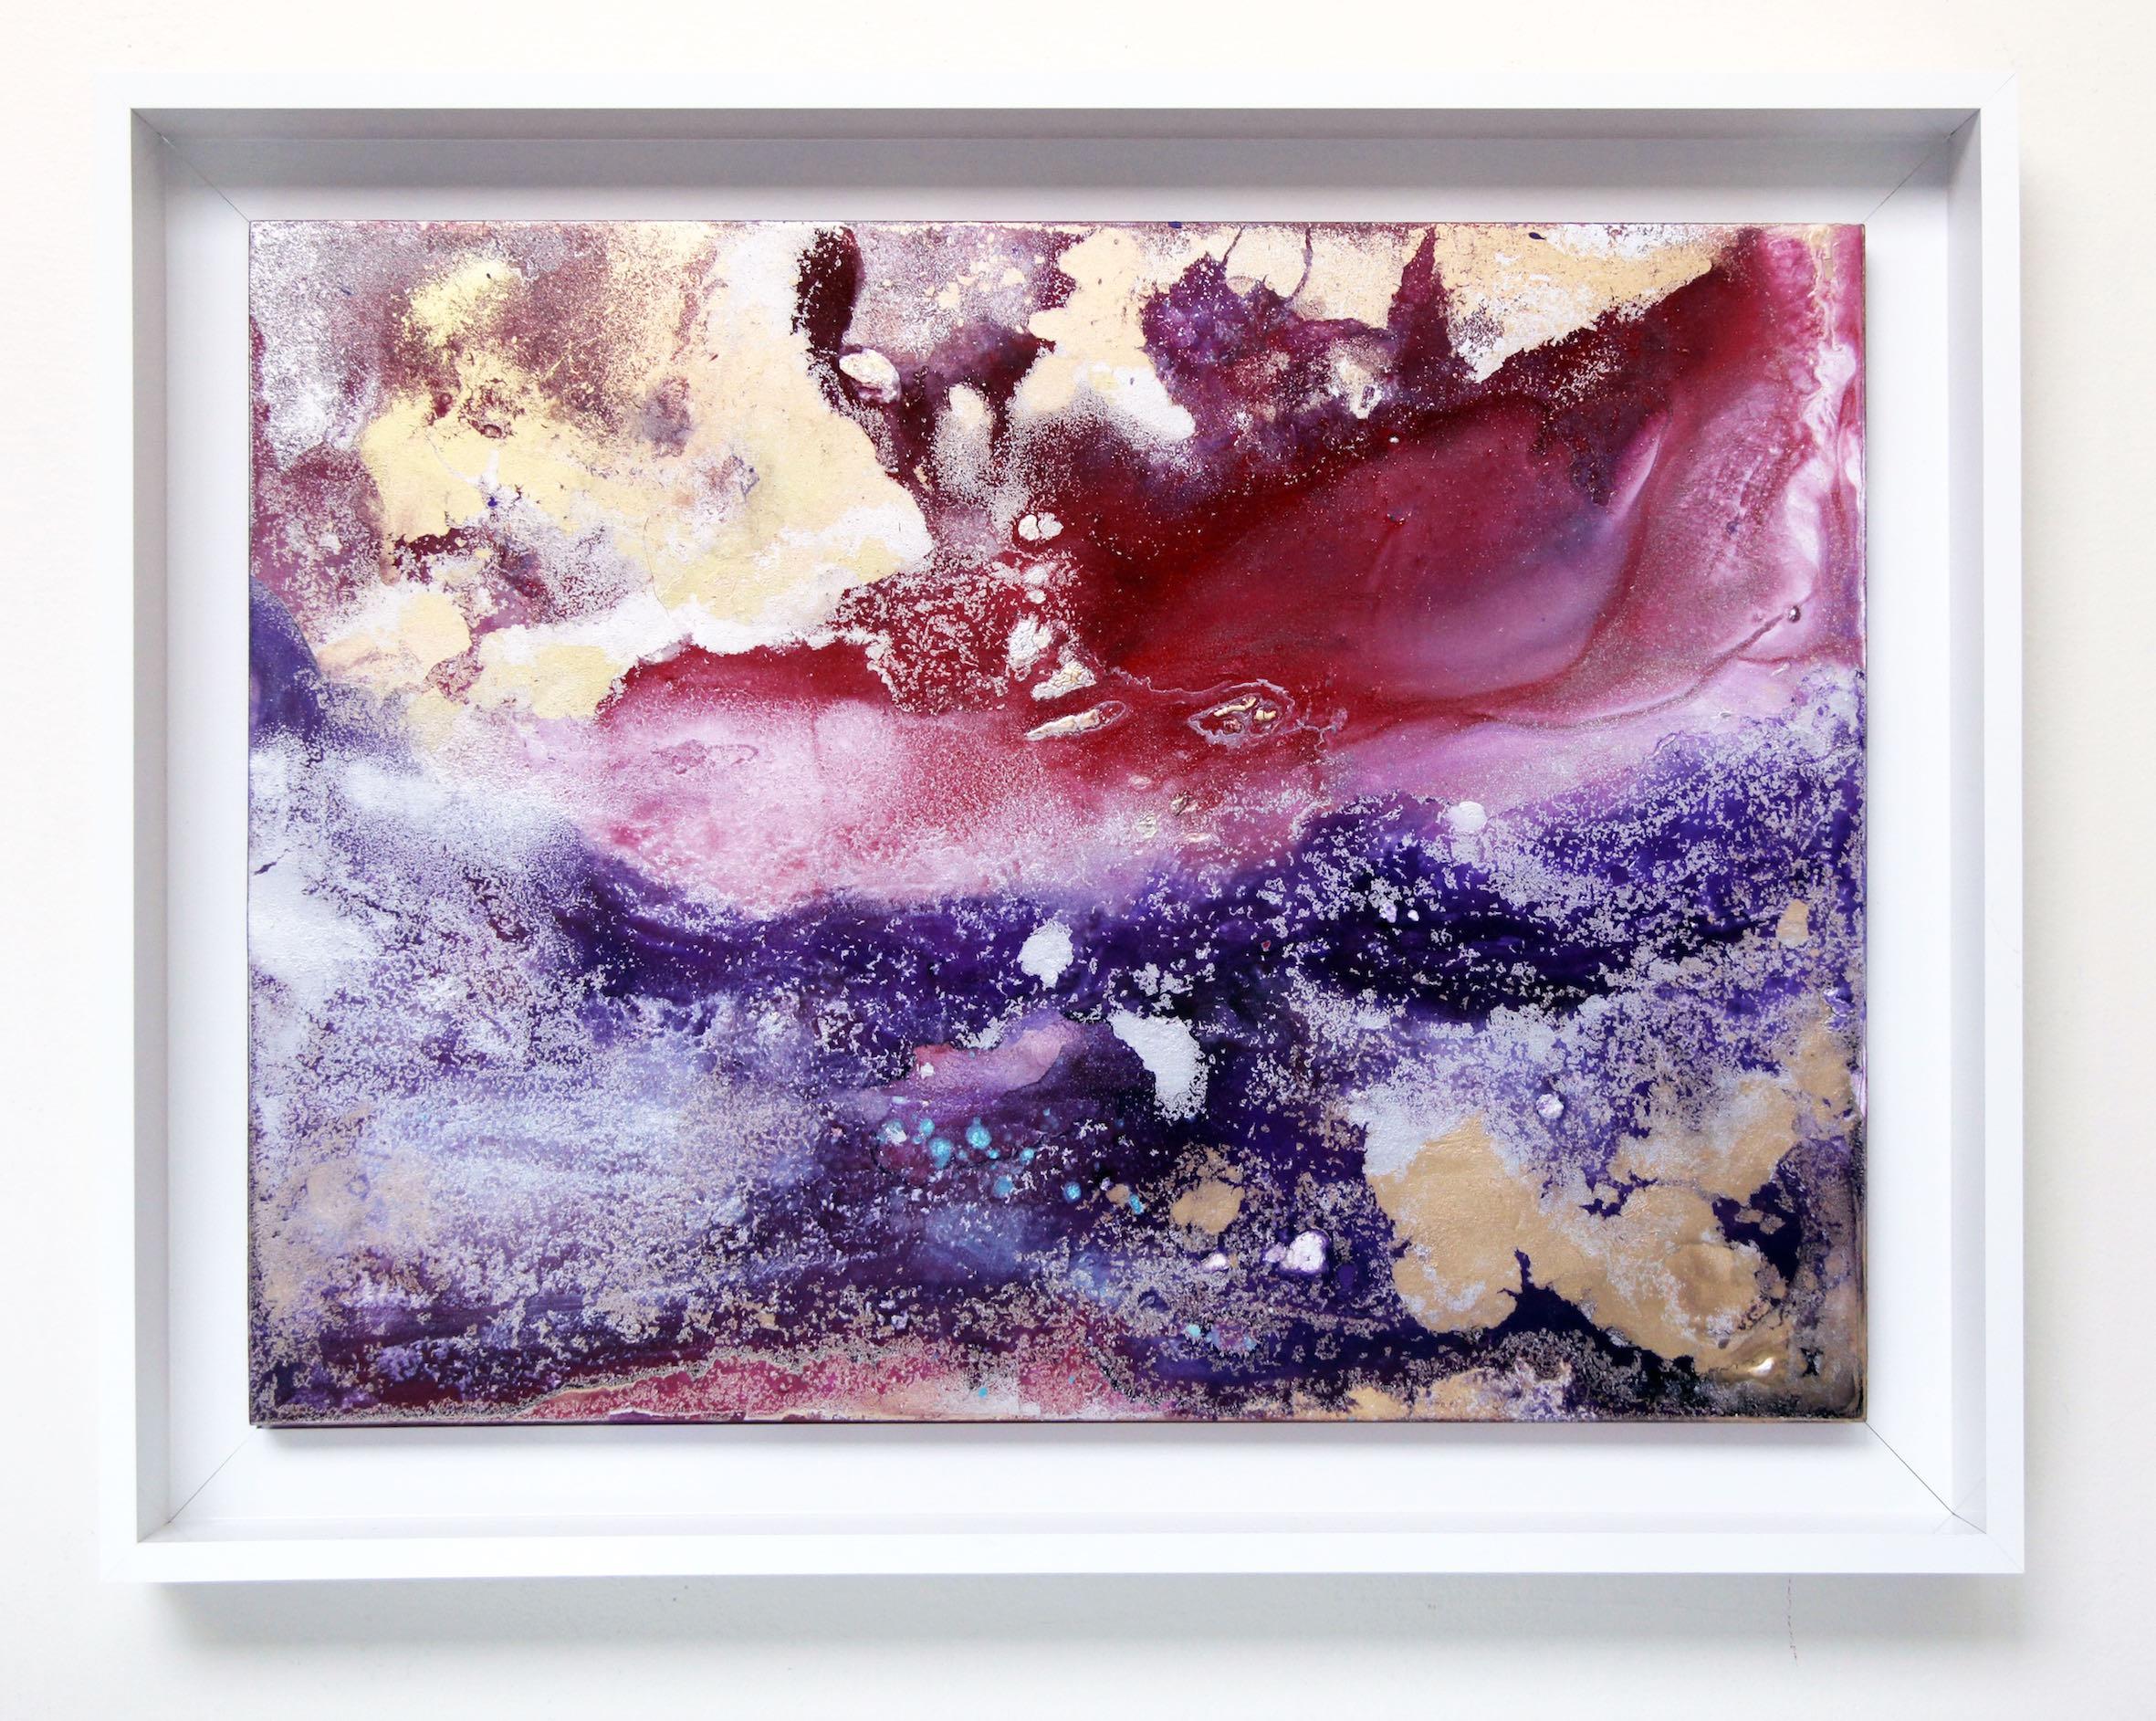 RED #2  2015  Acrylic and metal powder on board  H33.3cm x W45.5cm